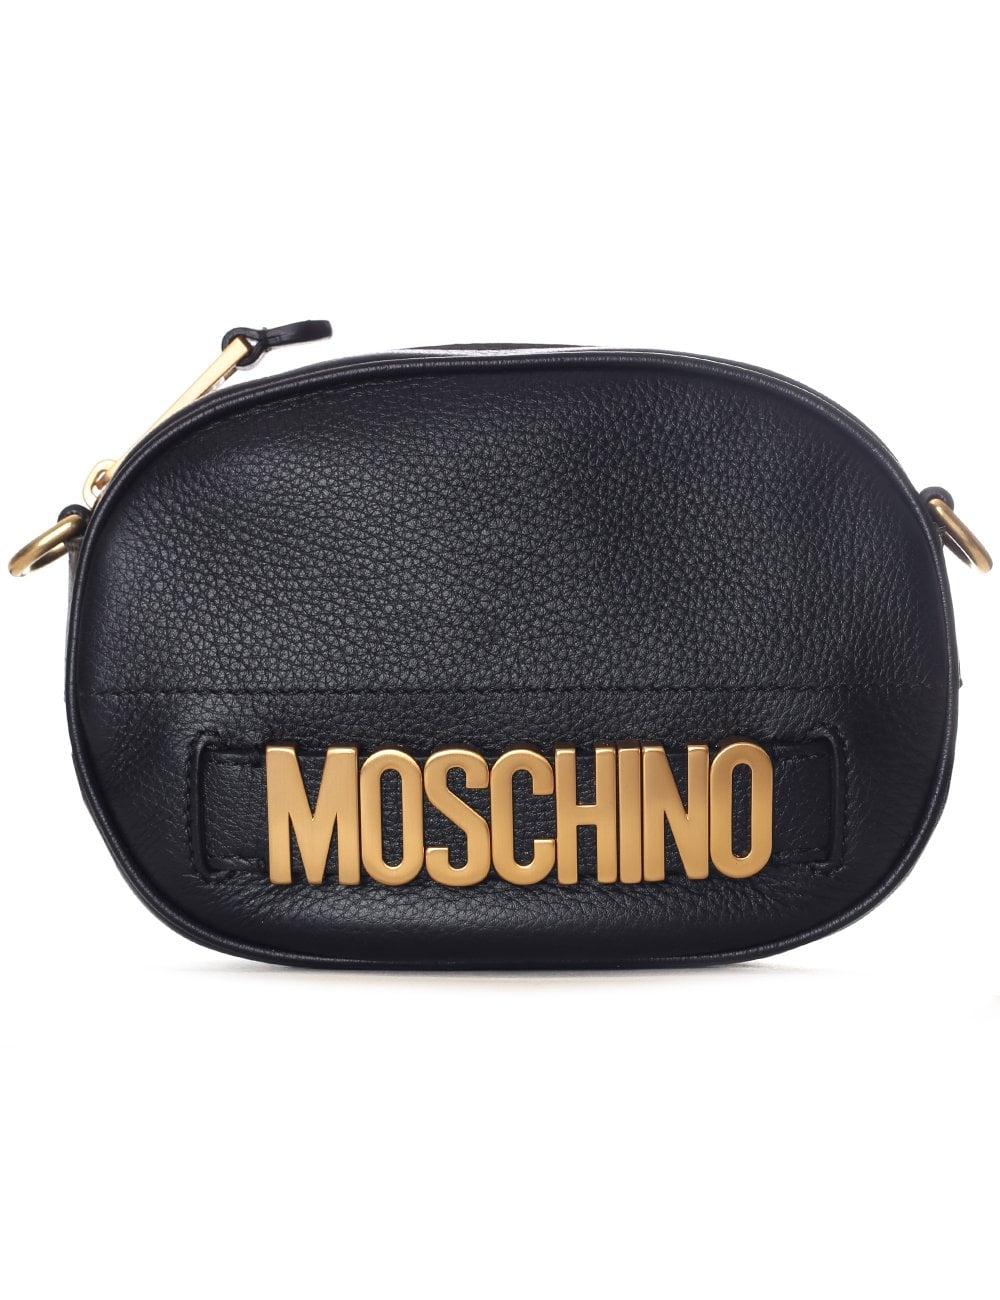 8d47eb80e3281 Moschino Couture Women's Gold Metal Logo Shoulder Bag